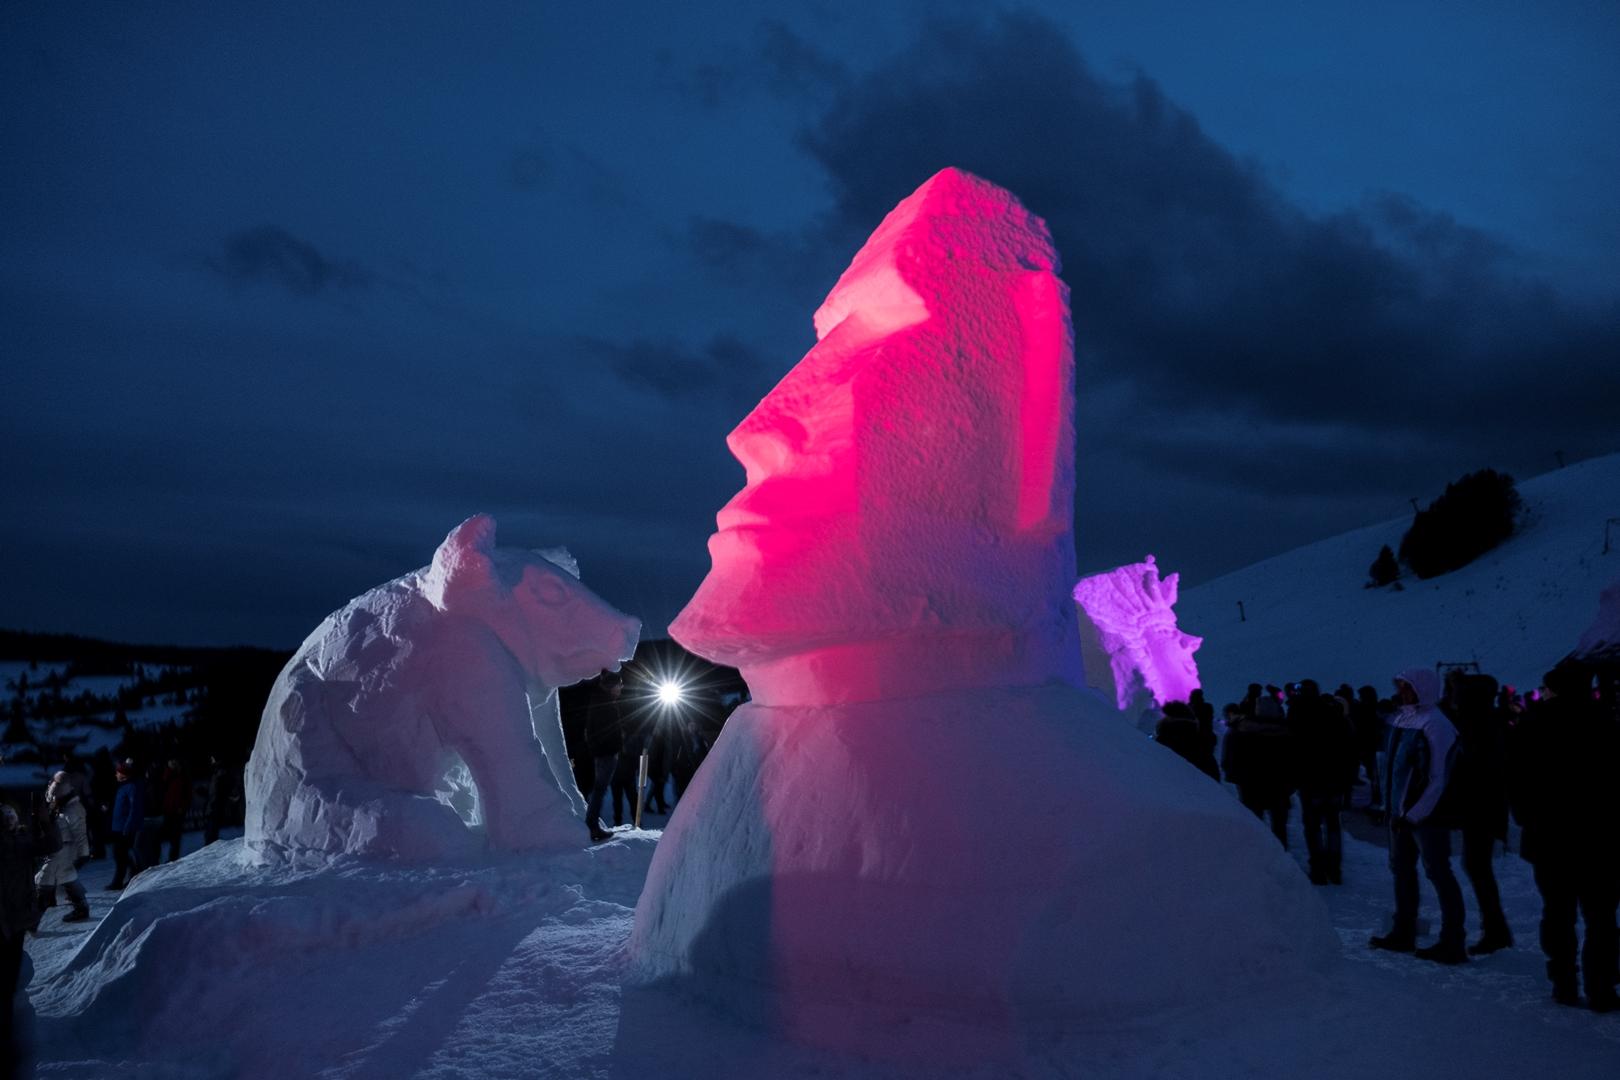 Nr. 11 Schneeskulpturen-Festival Bernau im Schwarzwald